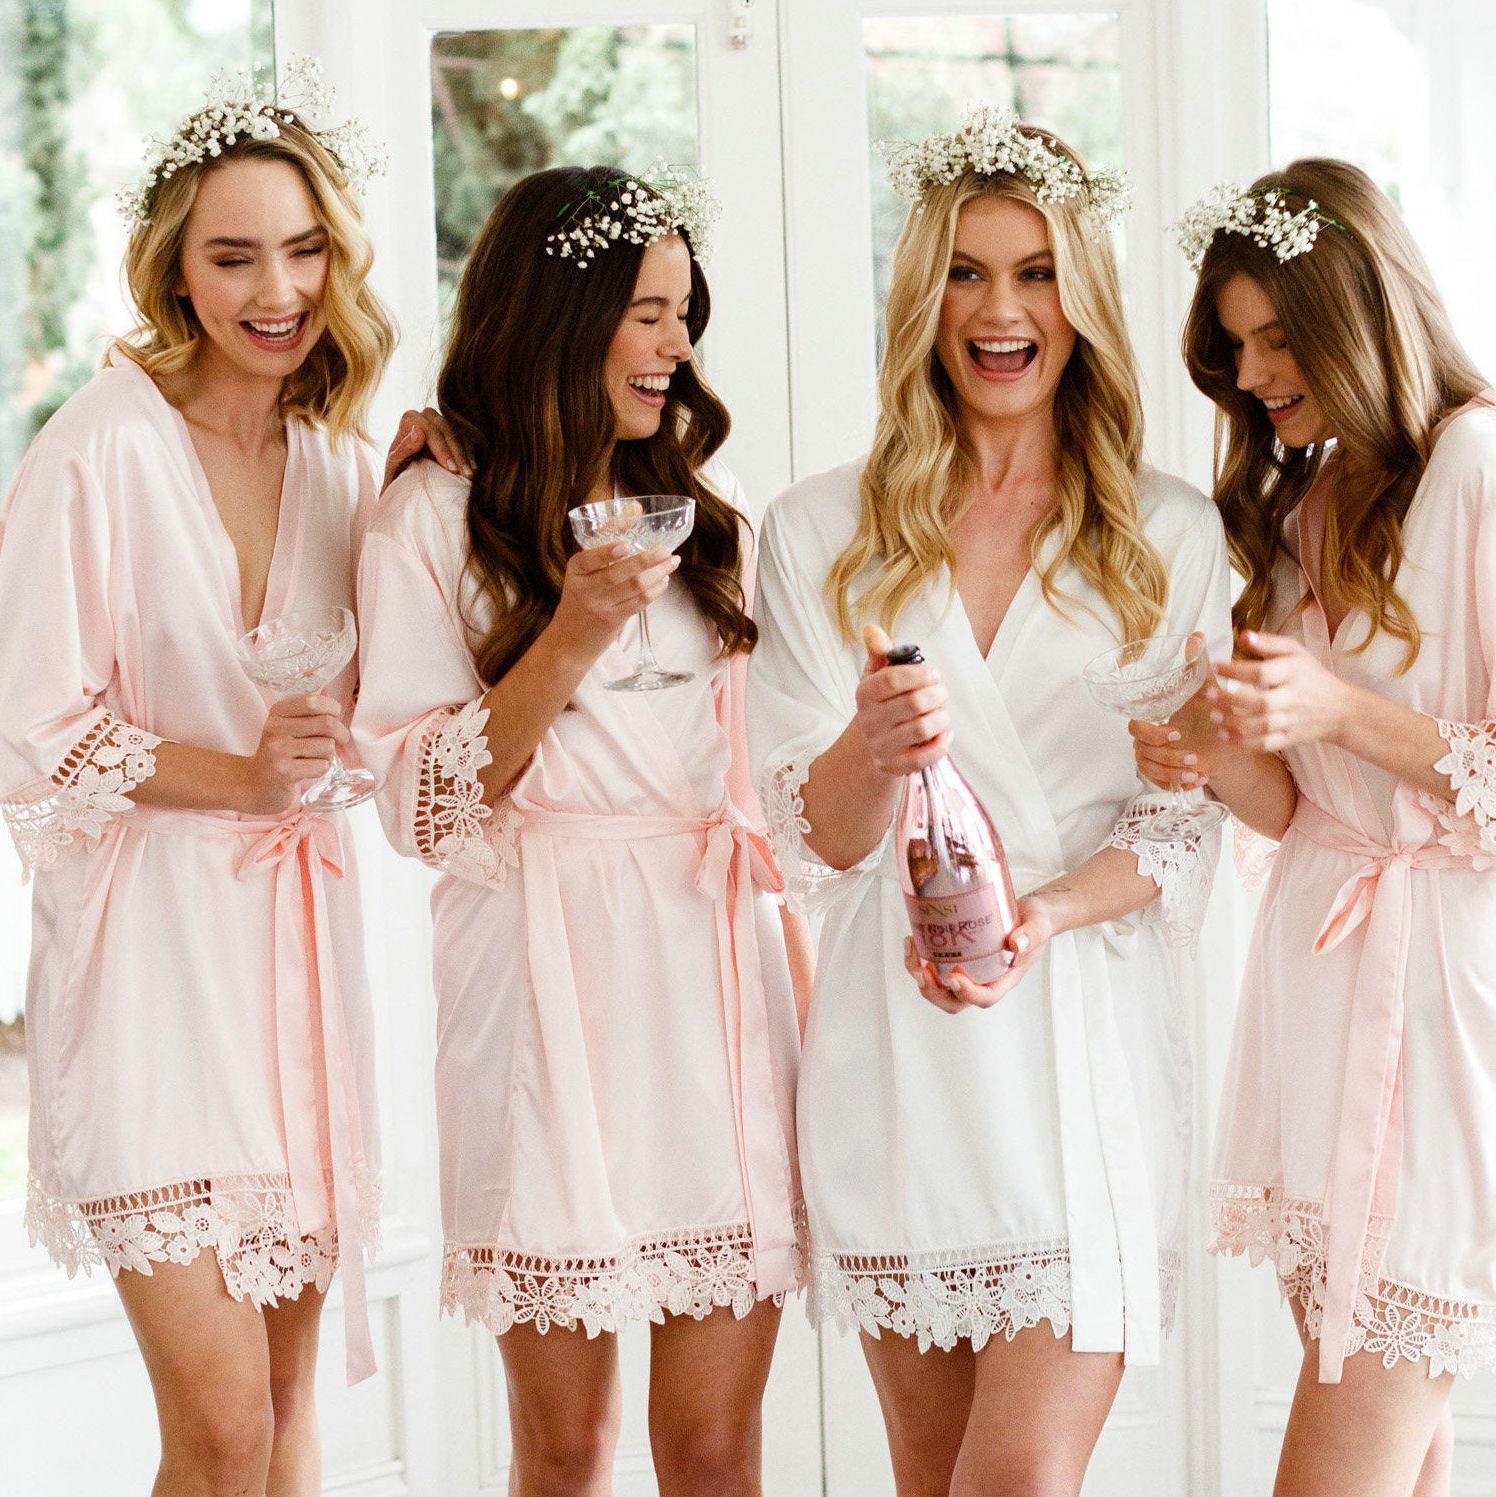 Owiter 2019 Women Matt Satin Lace Robe Bride Robe Bridesmaid Robes Bridal Wedding Robe Bathrobe Sleepwear Dressing White Robes